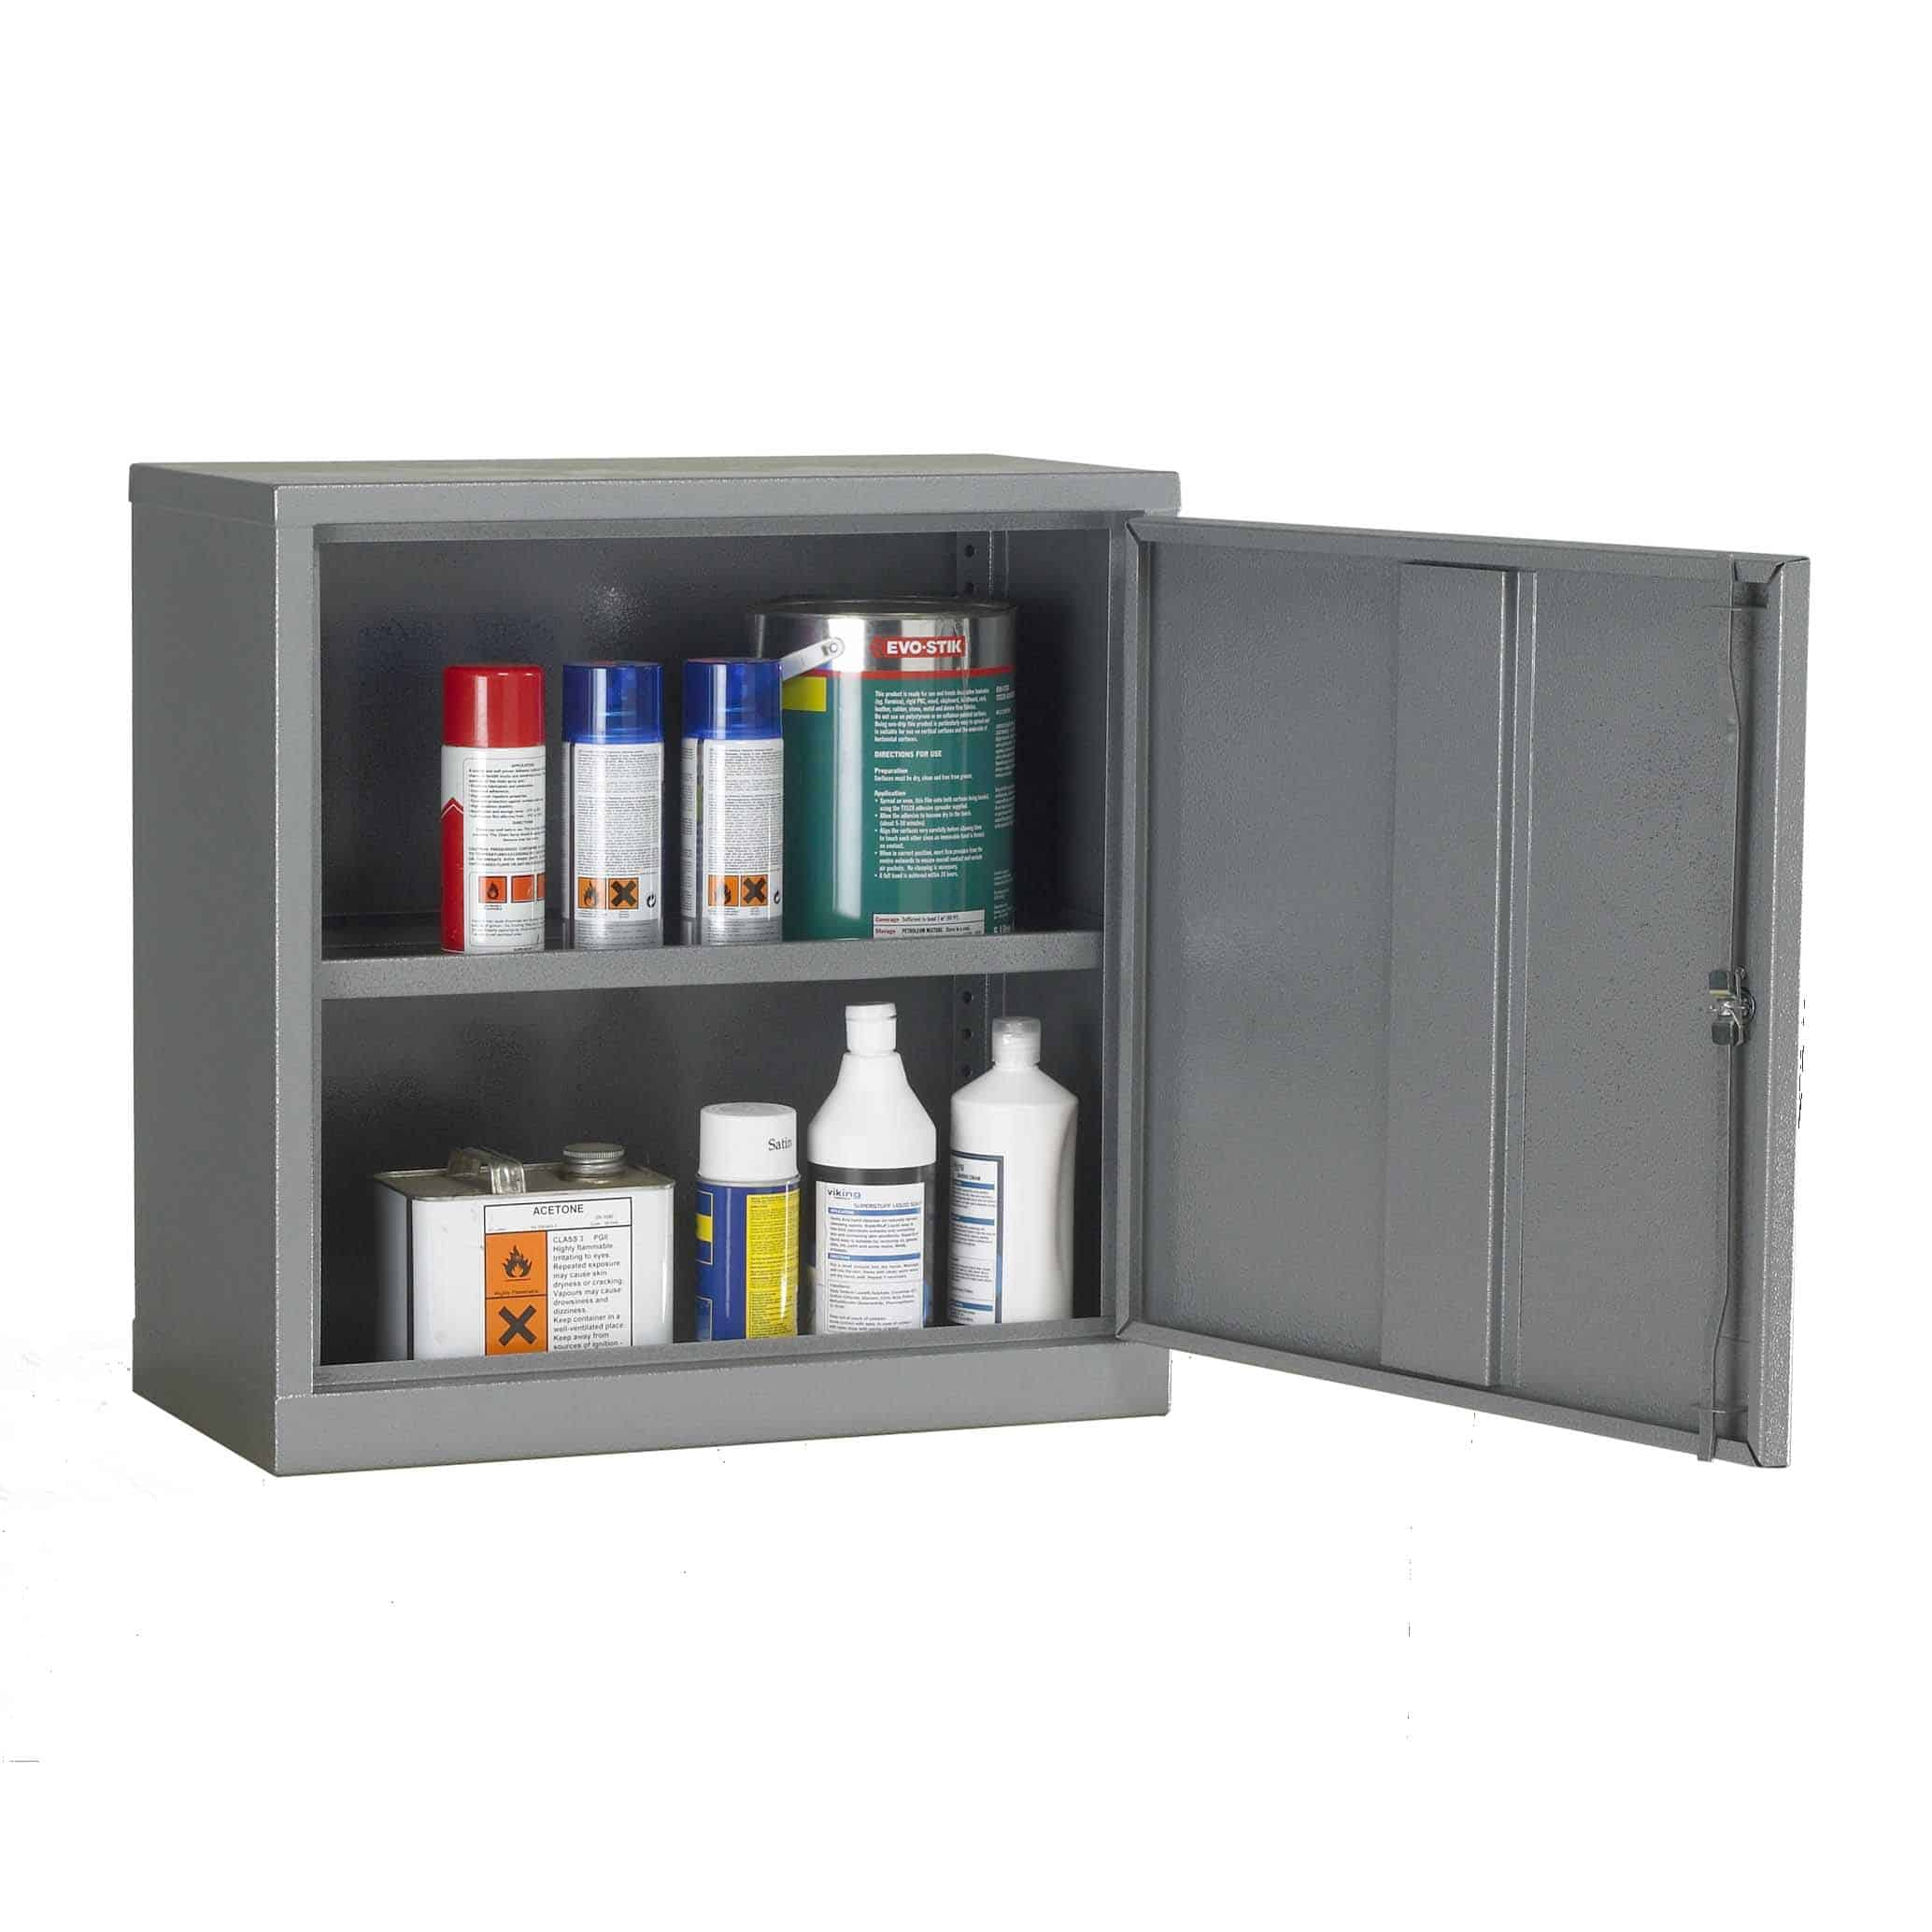 SU03C COSHH Storage Cabinets